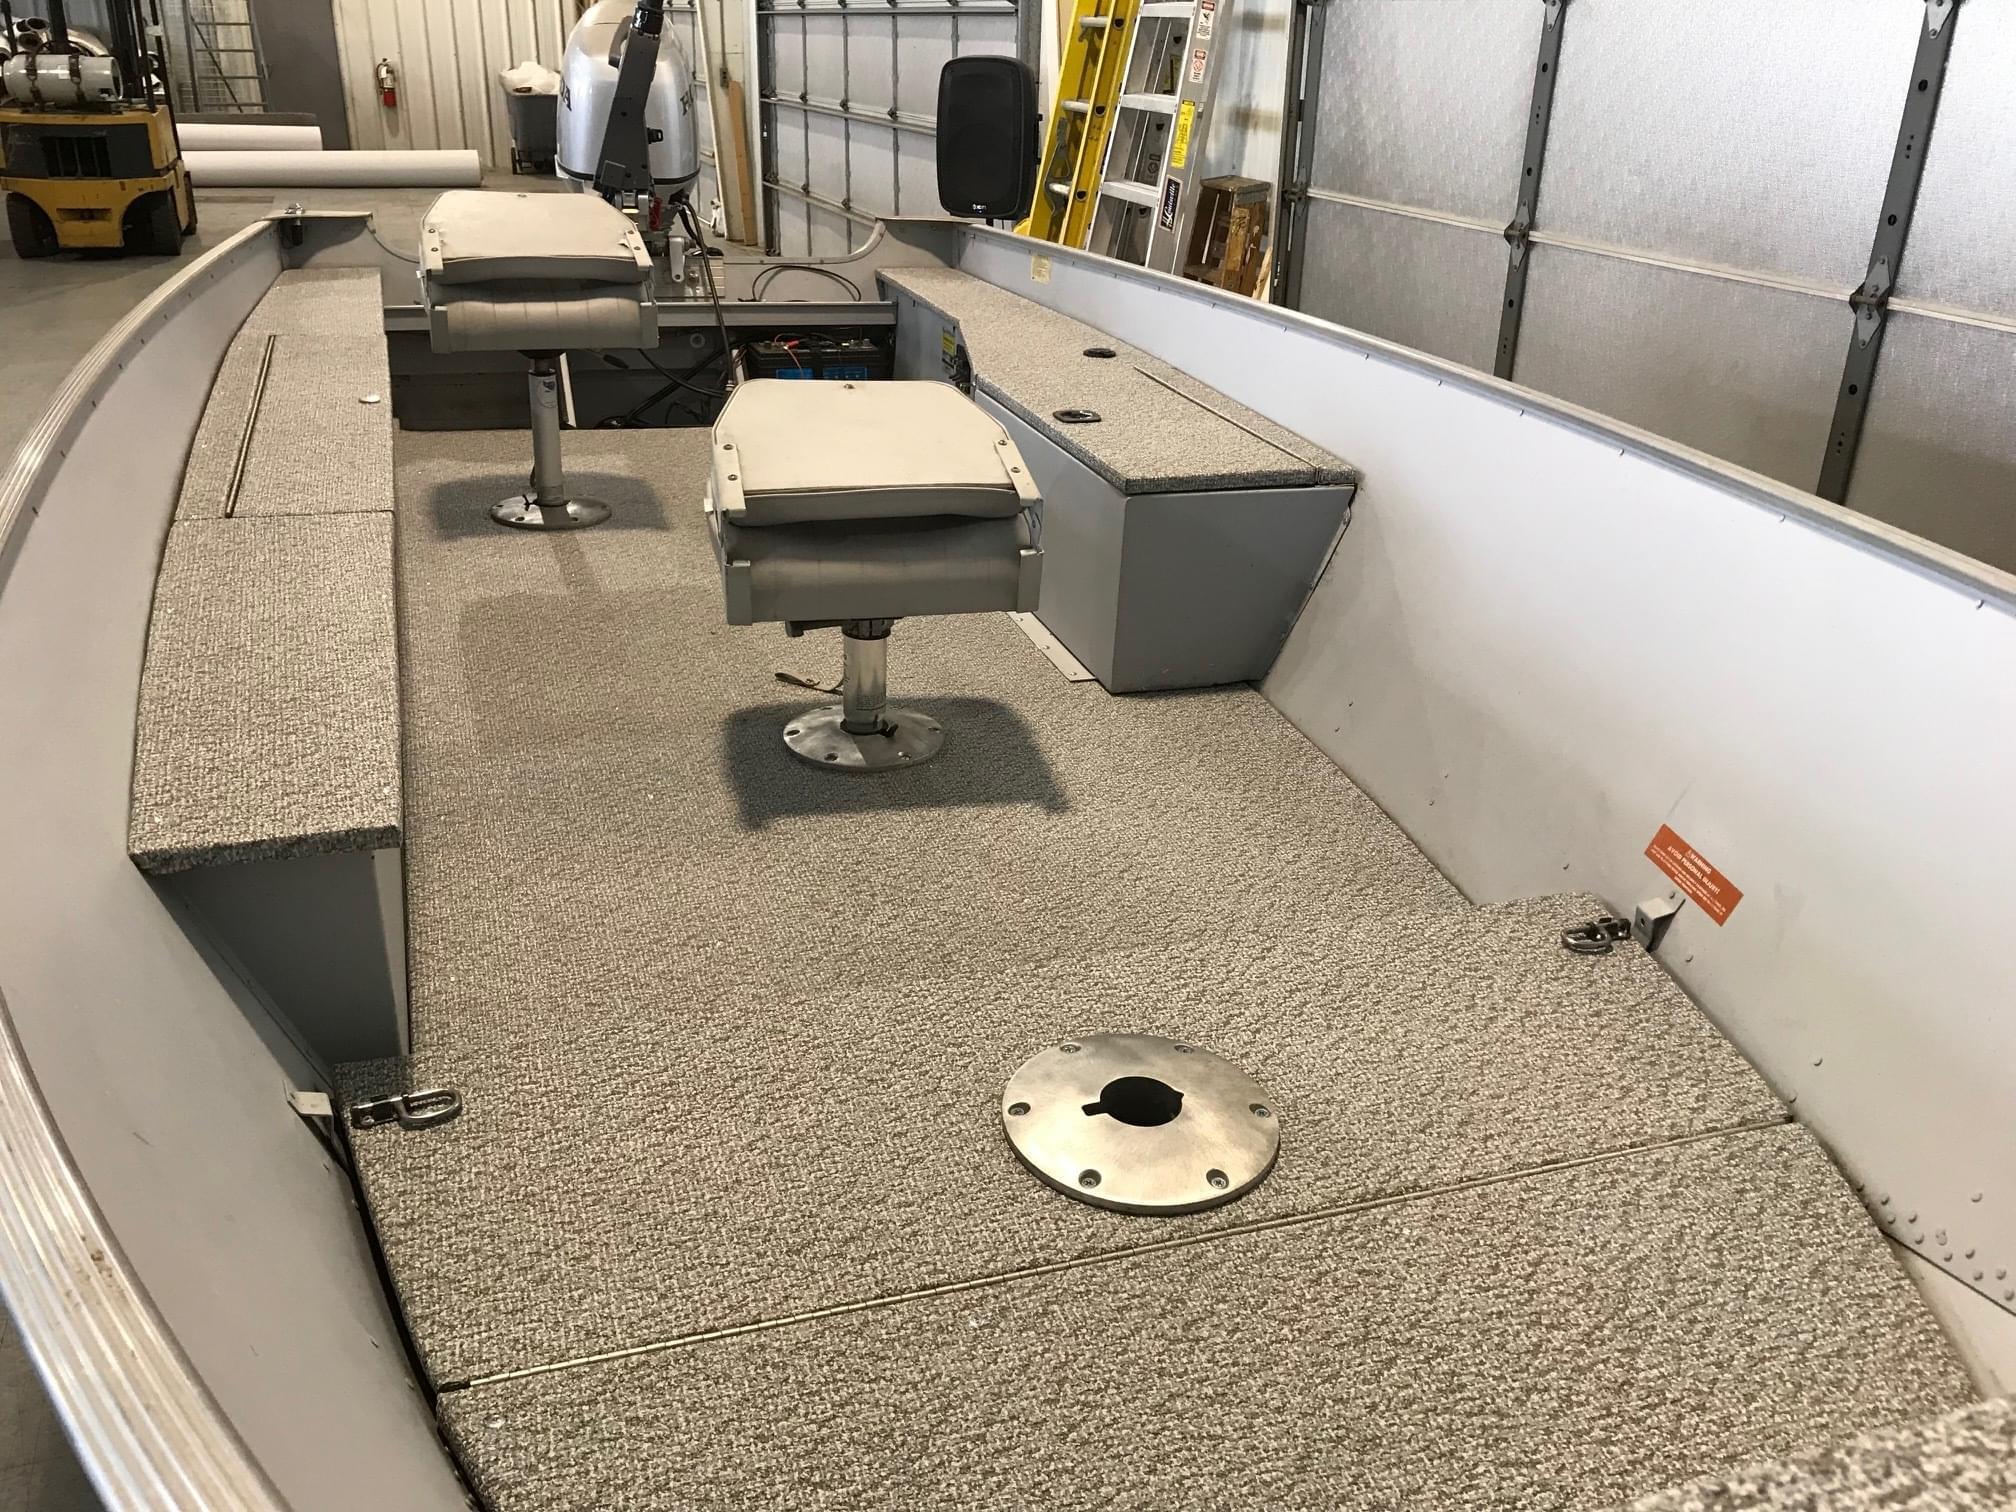 Hardwood Flooring Detroit Mi Of Downriver Carpet Flooring for Carpet Replacement